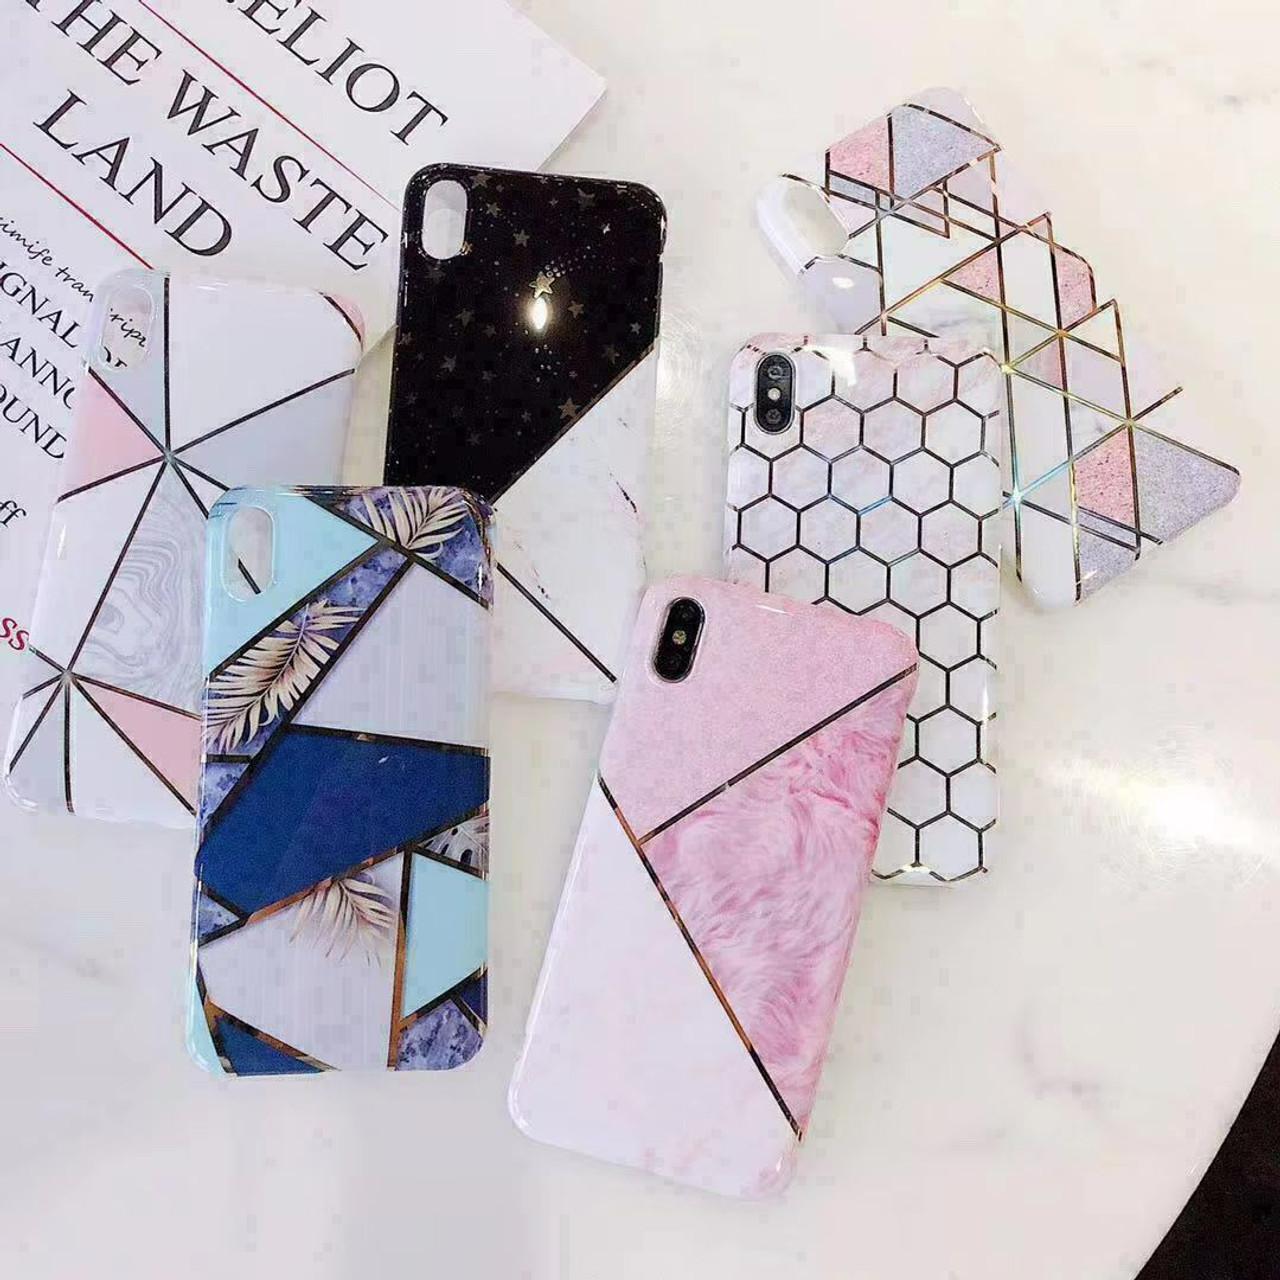 For iPhone 11 Pro XS MAX XR Mini 8 7 Plus Cute Glitter Marble Case Cover Slim US